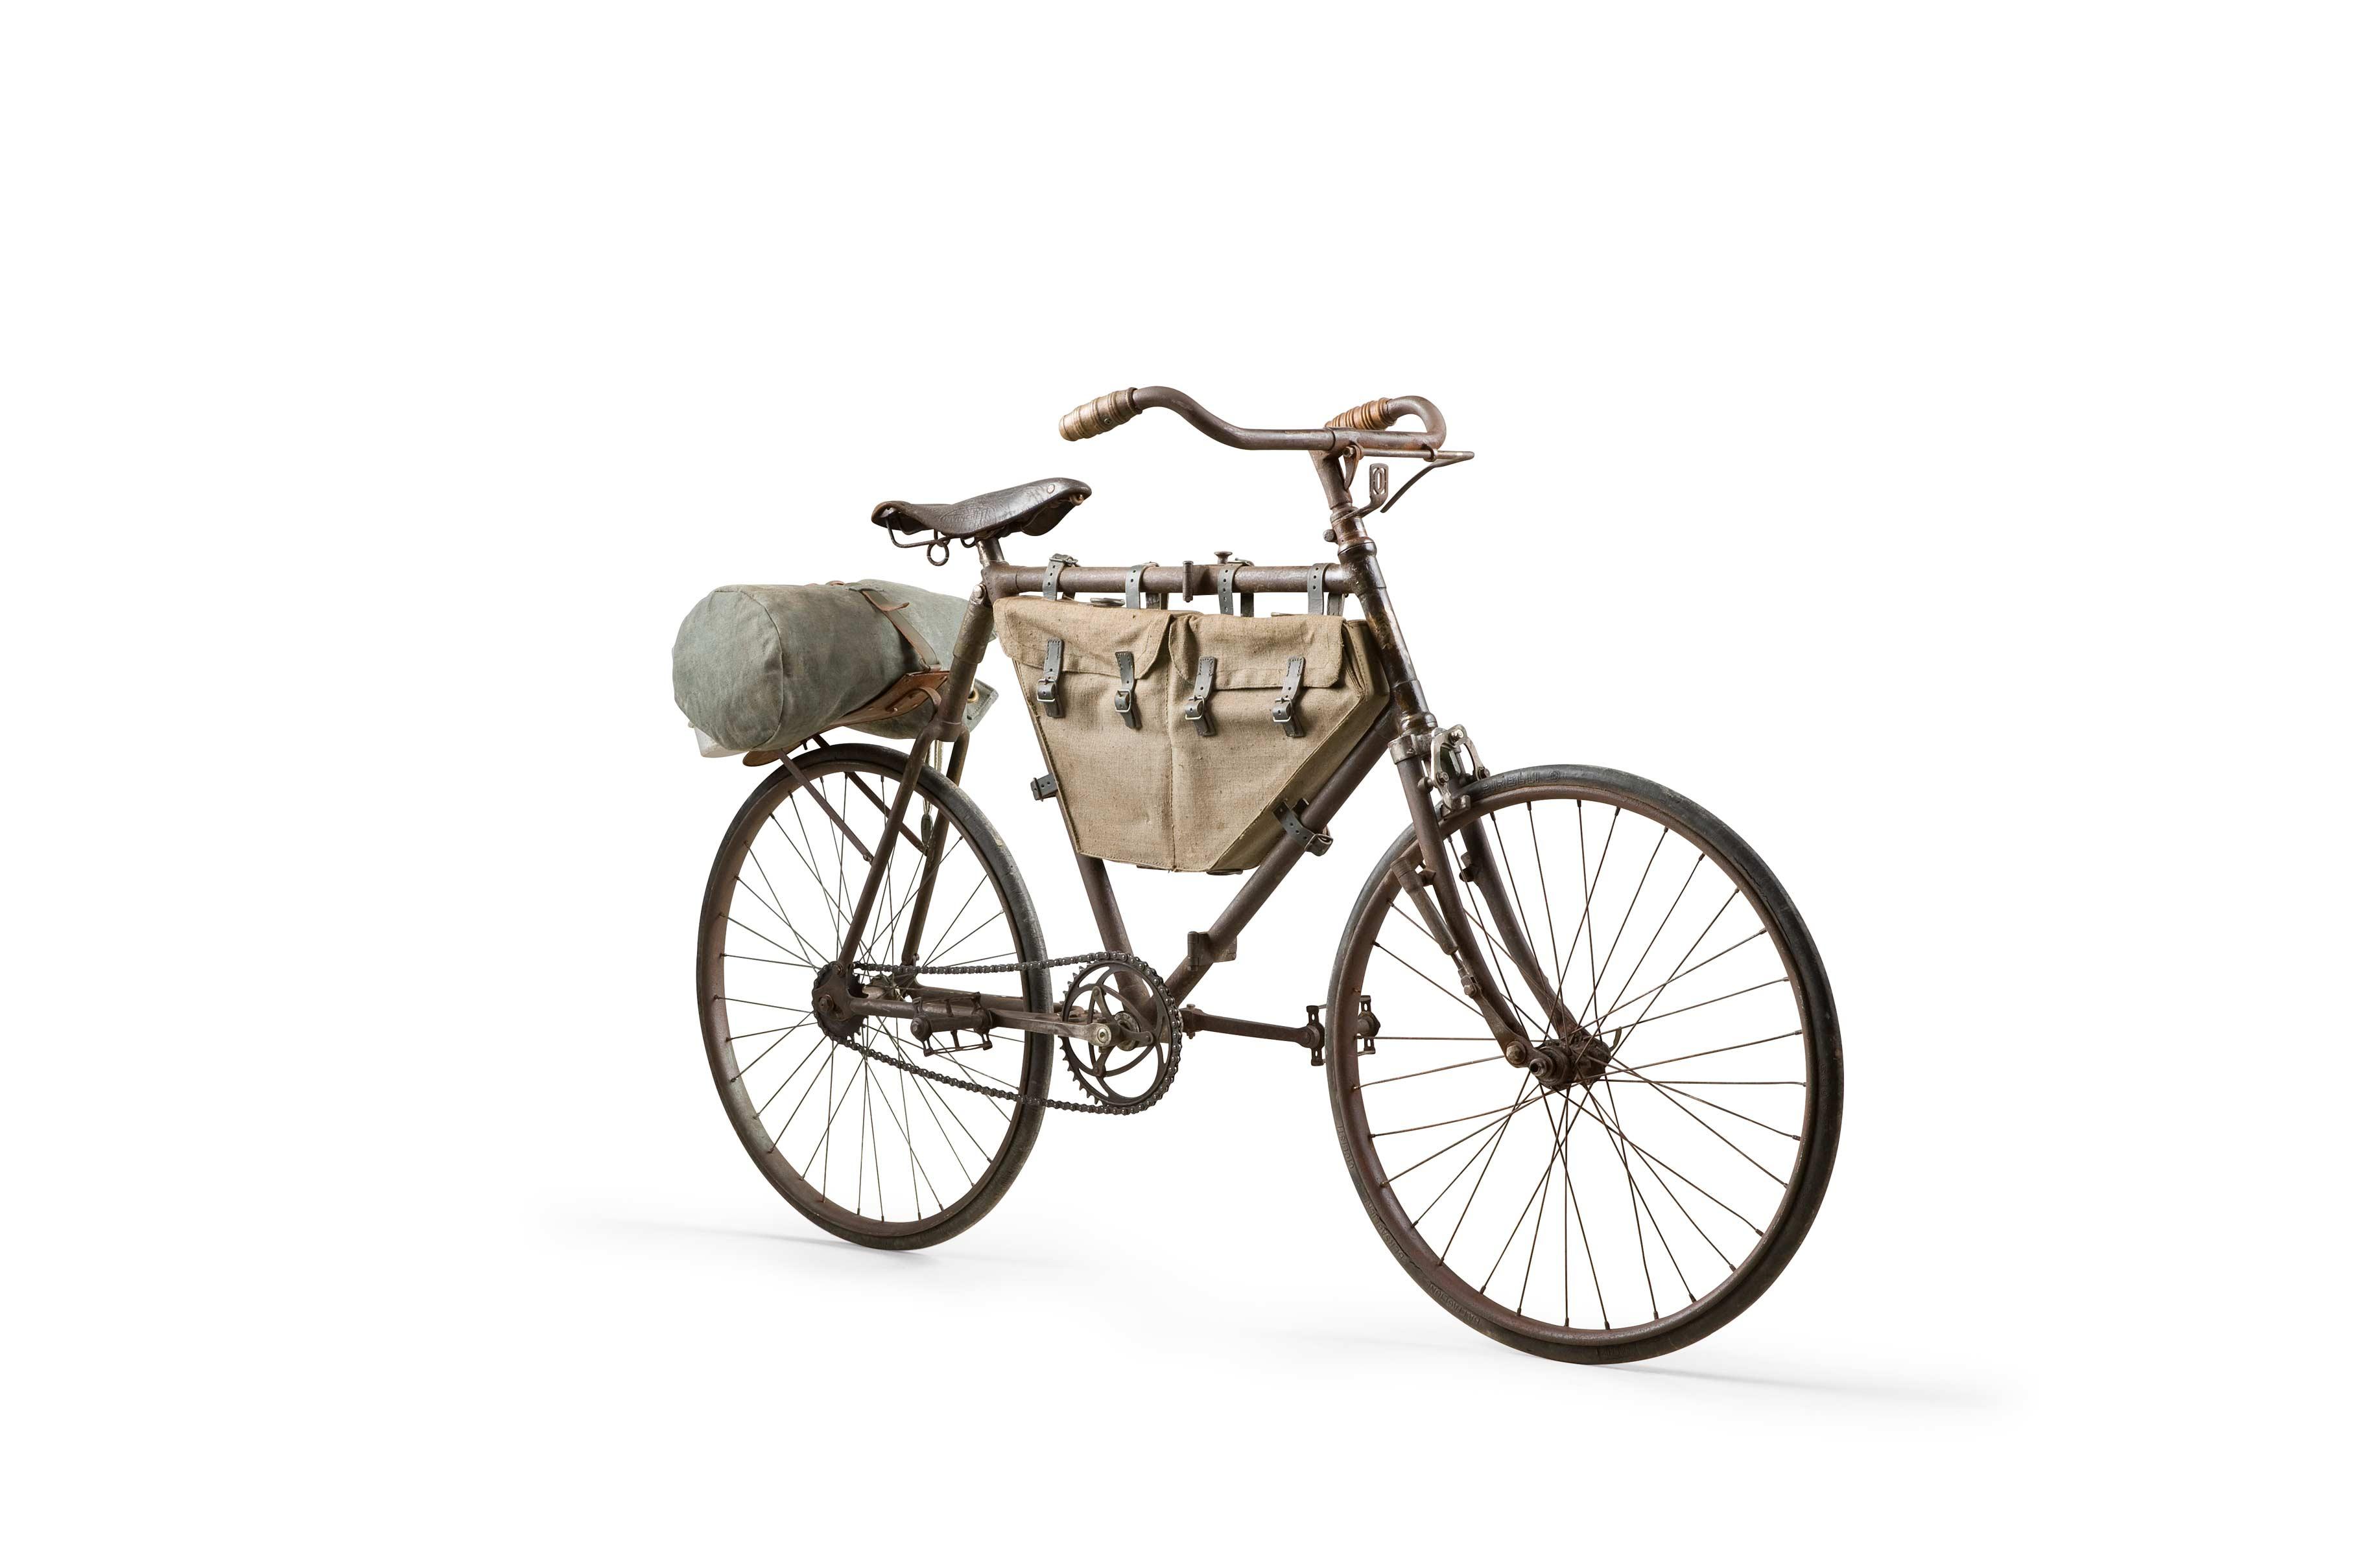 fahrrad in karlsruhe kaufen